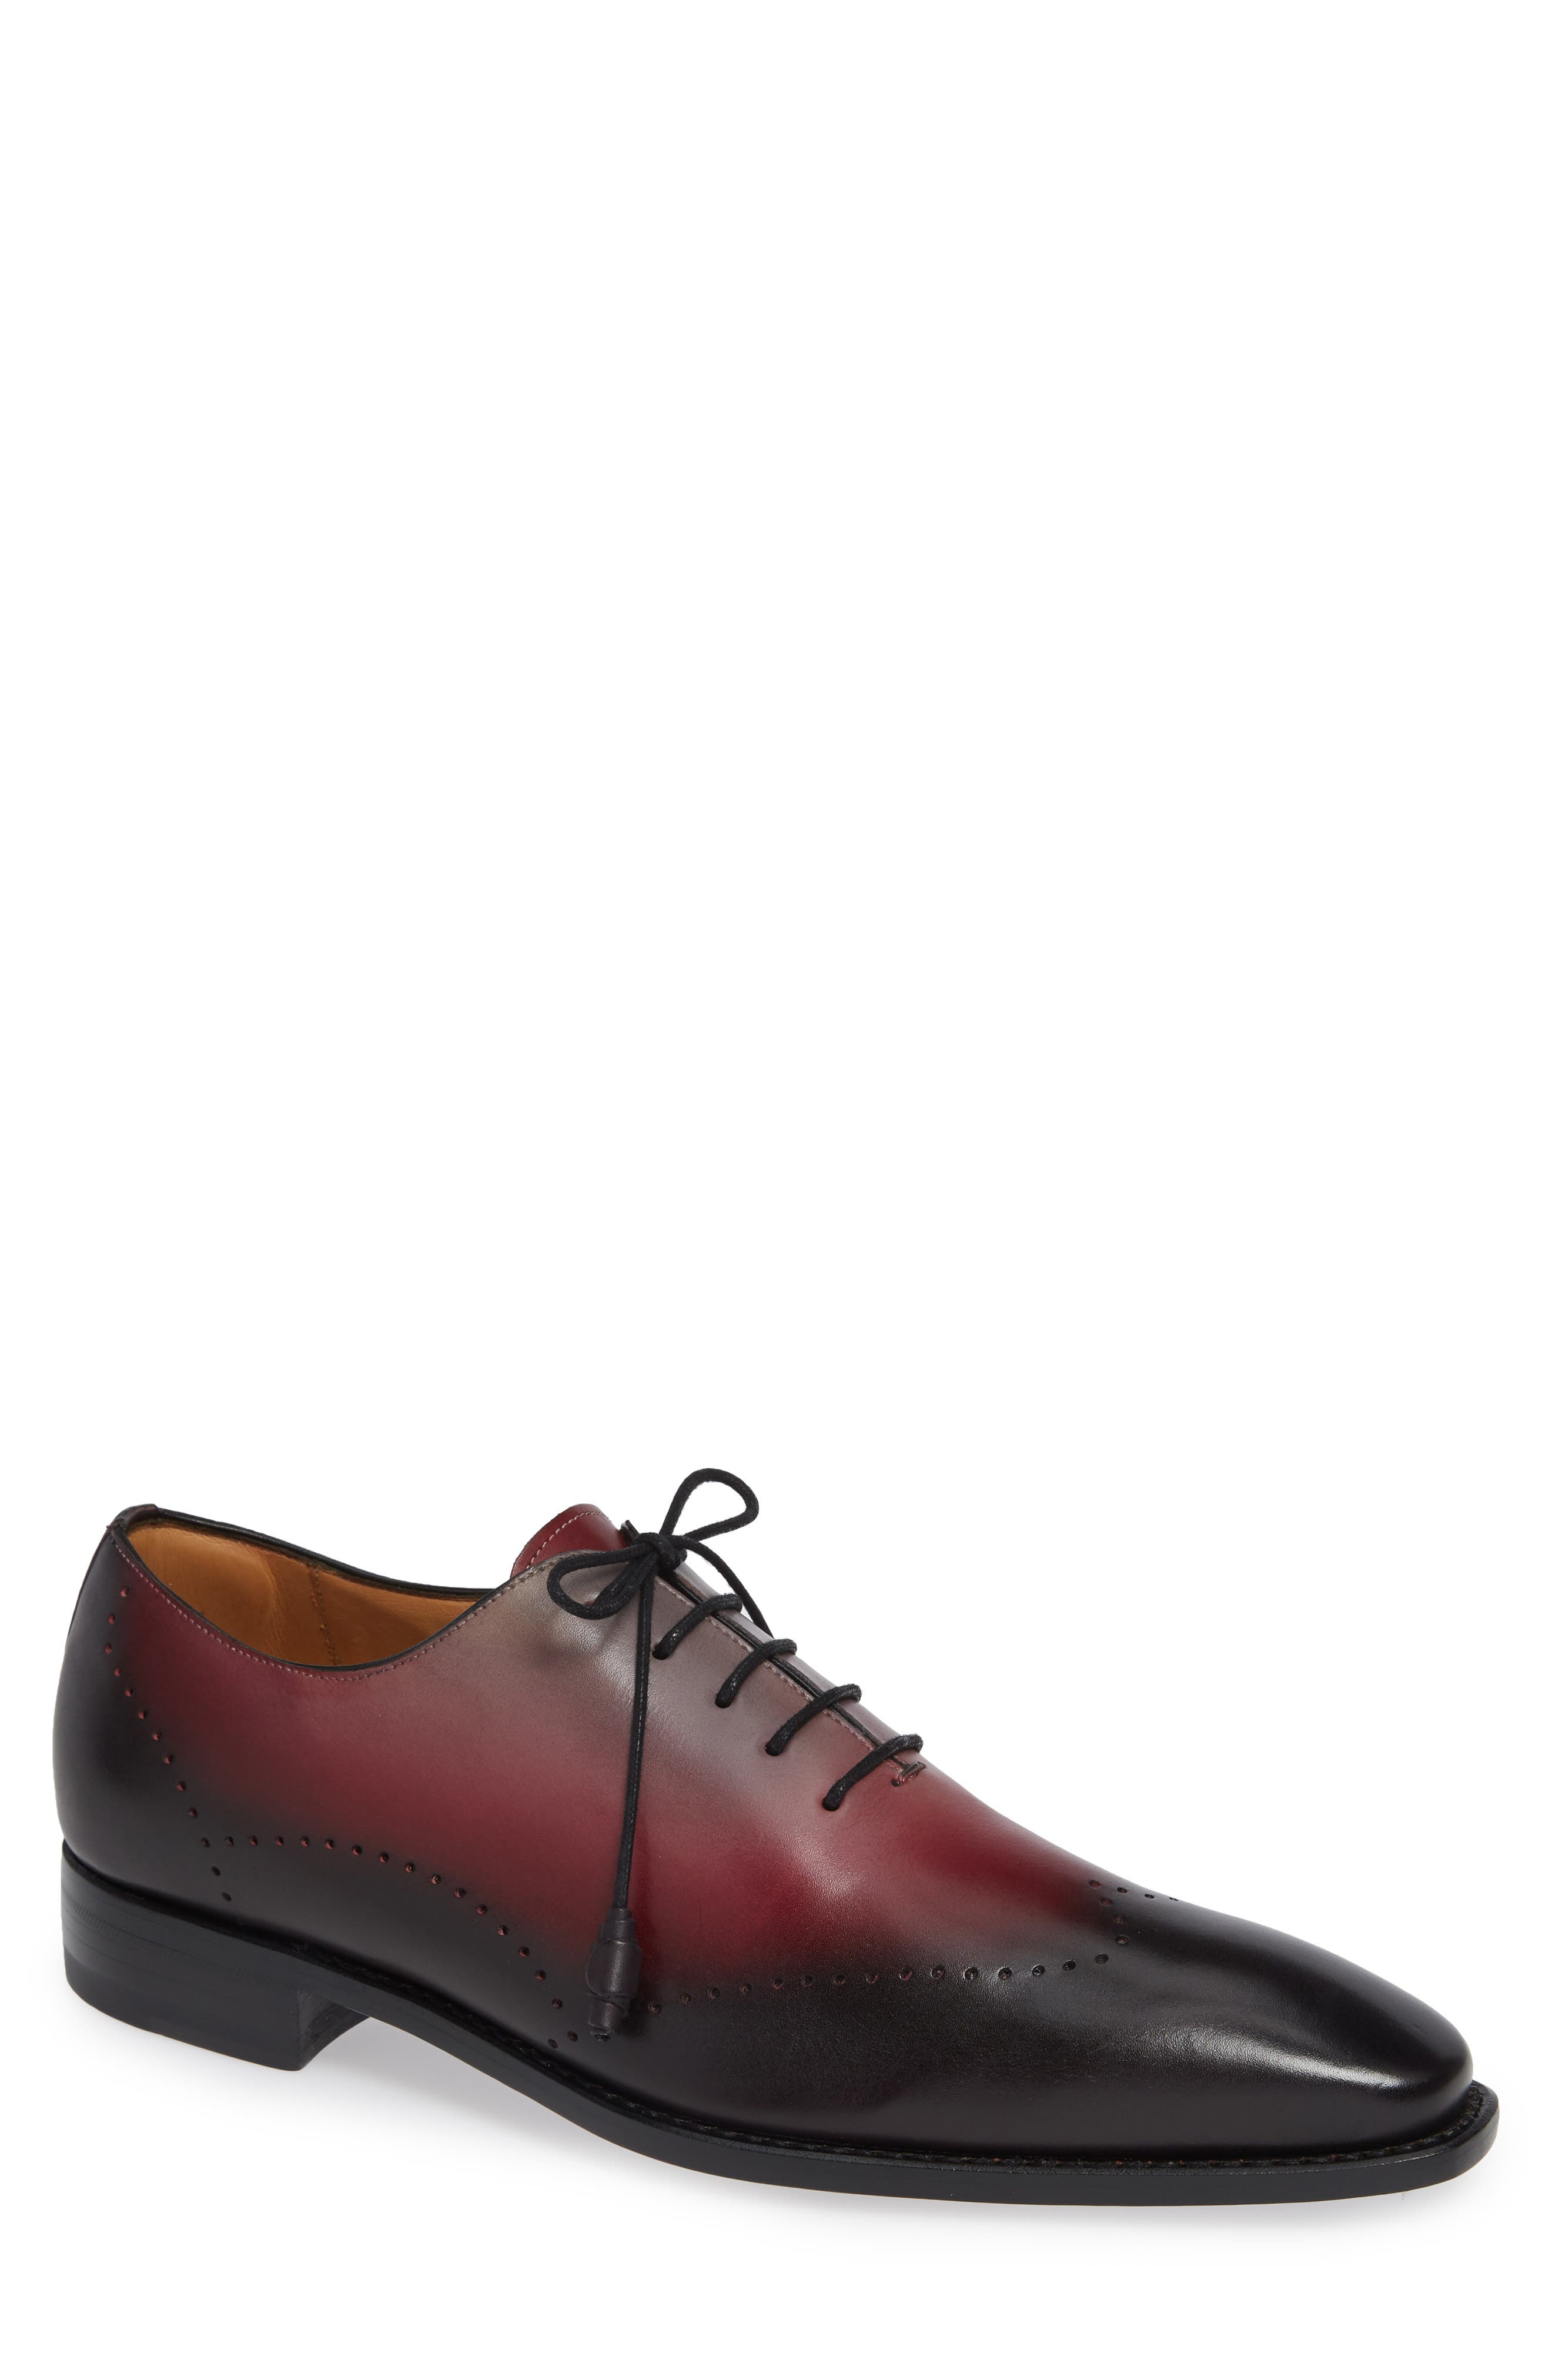 Addy Wingtip Whole Cut Shoe,                             Main thumbnail 1, color,                             BLACK LEATHER